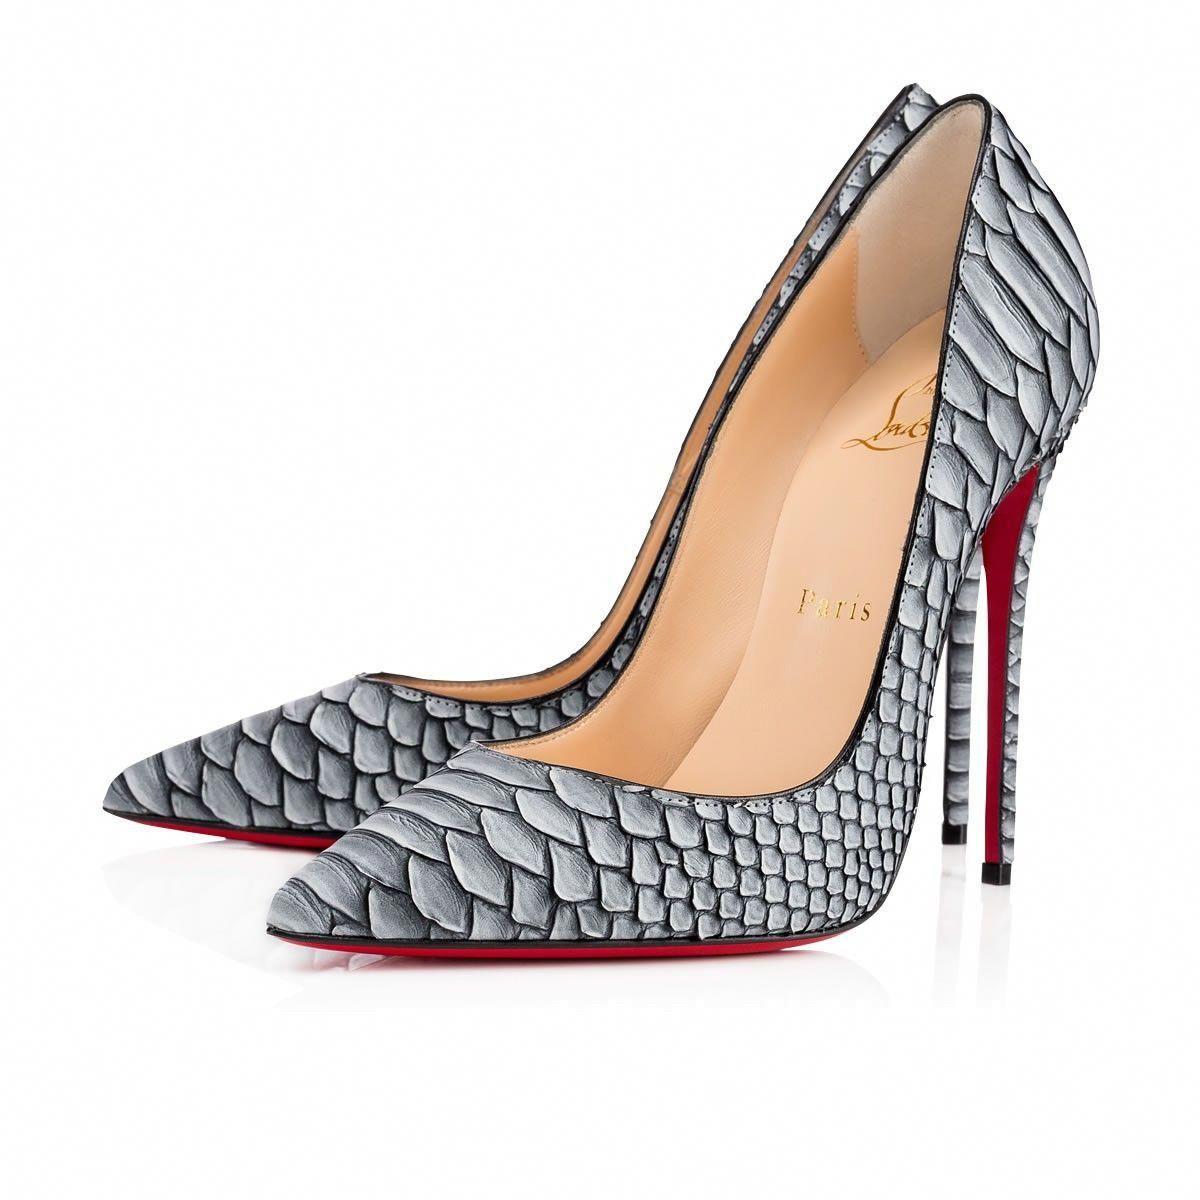 f72c8099868 CHRISTIAN LOUBOUTIN So Kate 120Mm Black Python.  christianlouboutin  shoes   thin heel